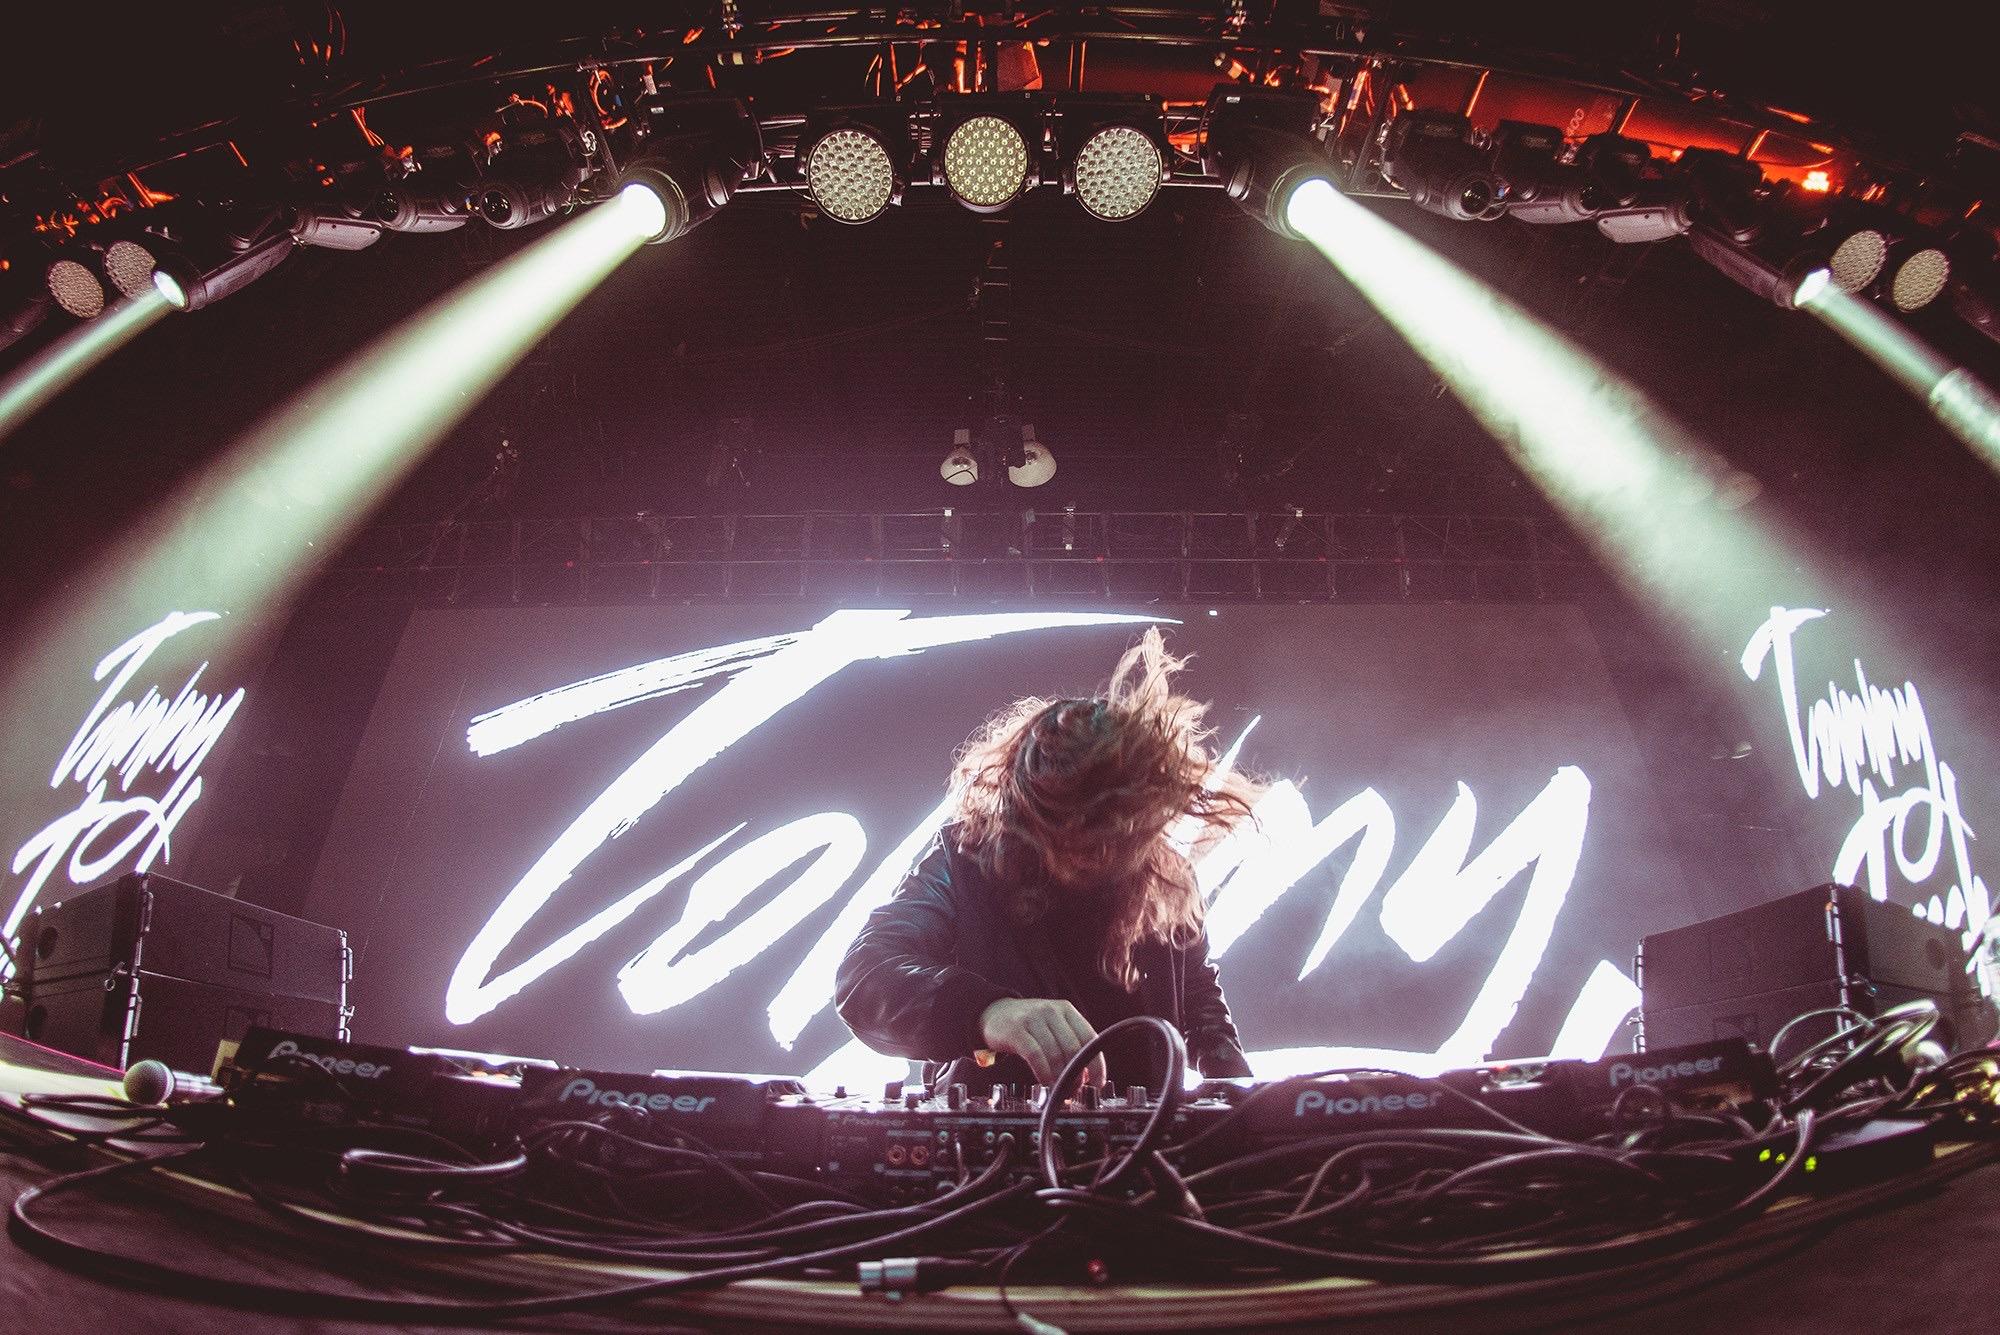 MTVなど多数のメディアが注目する豪州のDJ、Tommy Trash(トミー・トラッシュ)とは!